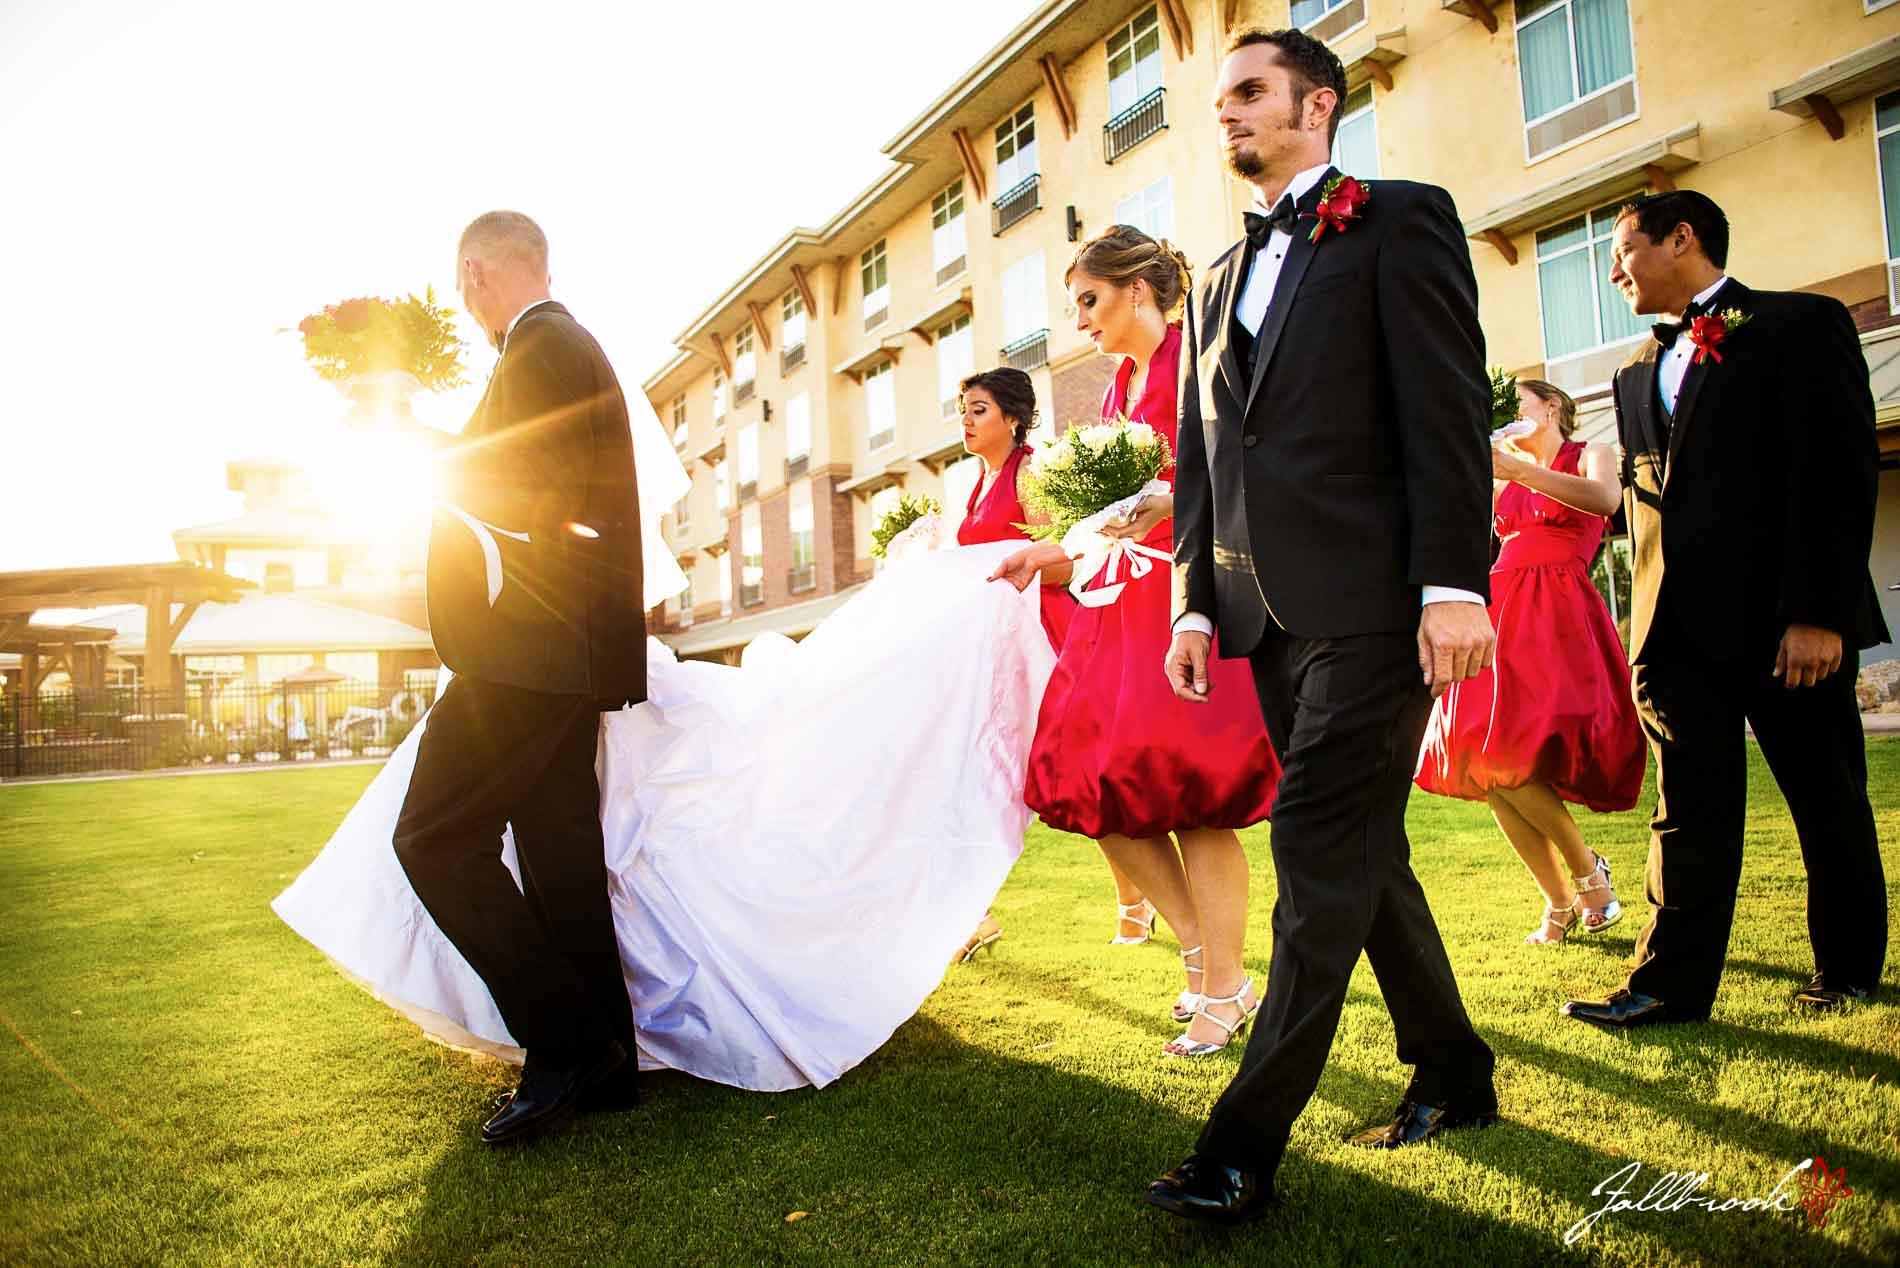 Wedding Reception Of Brian And Carolina At The Pivot Point, Hilton Garden  Inn In Yuma